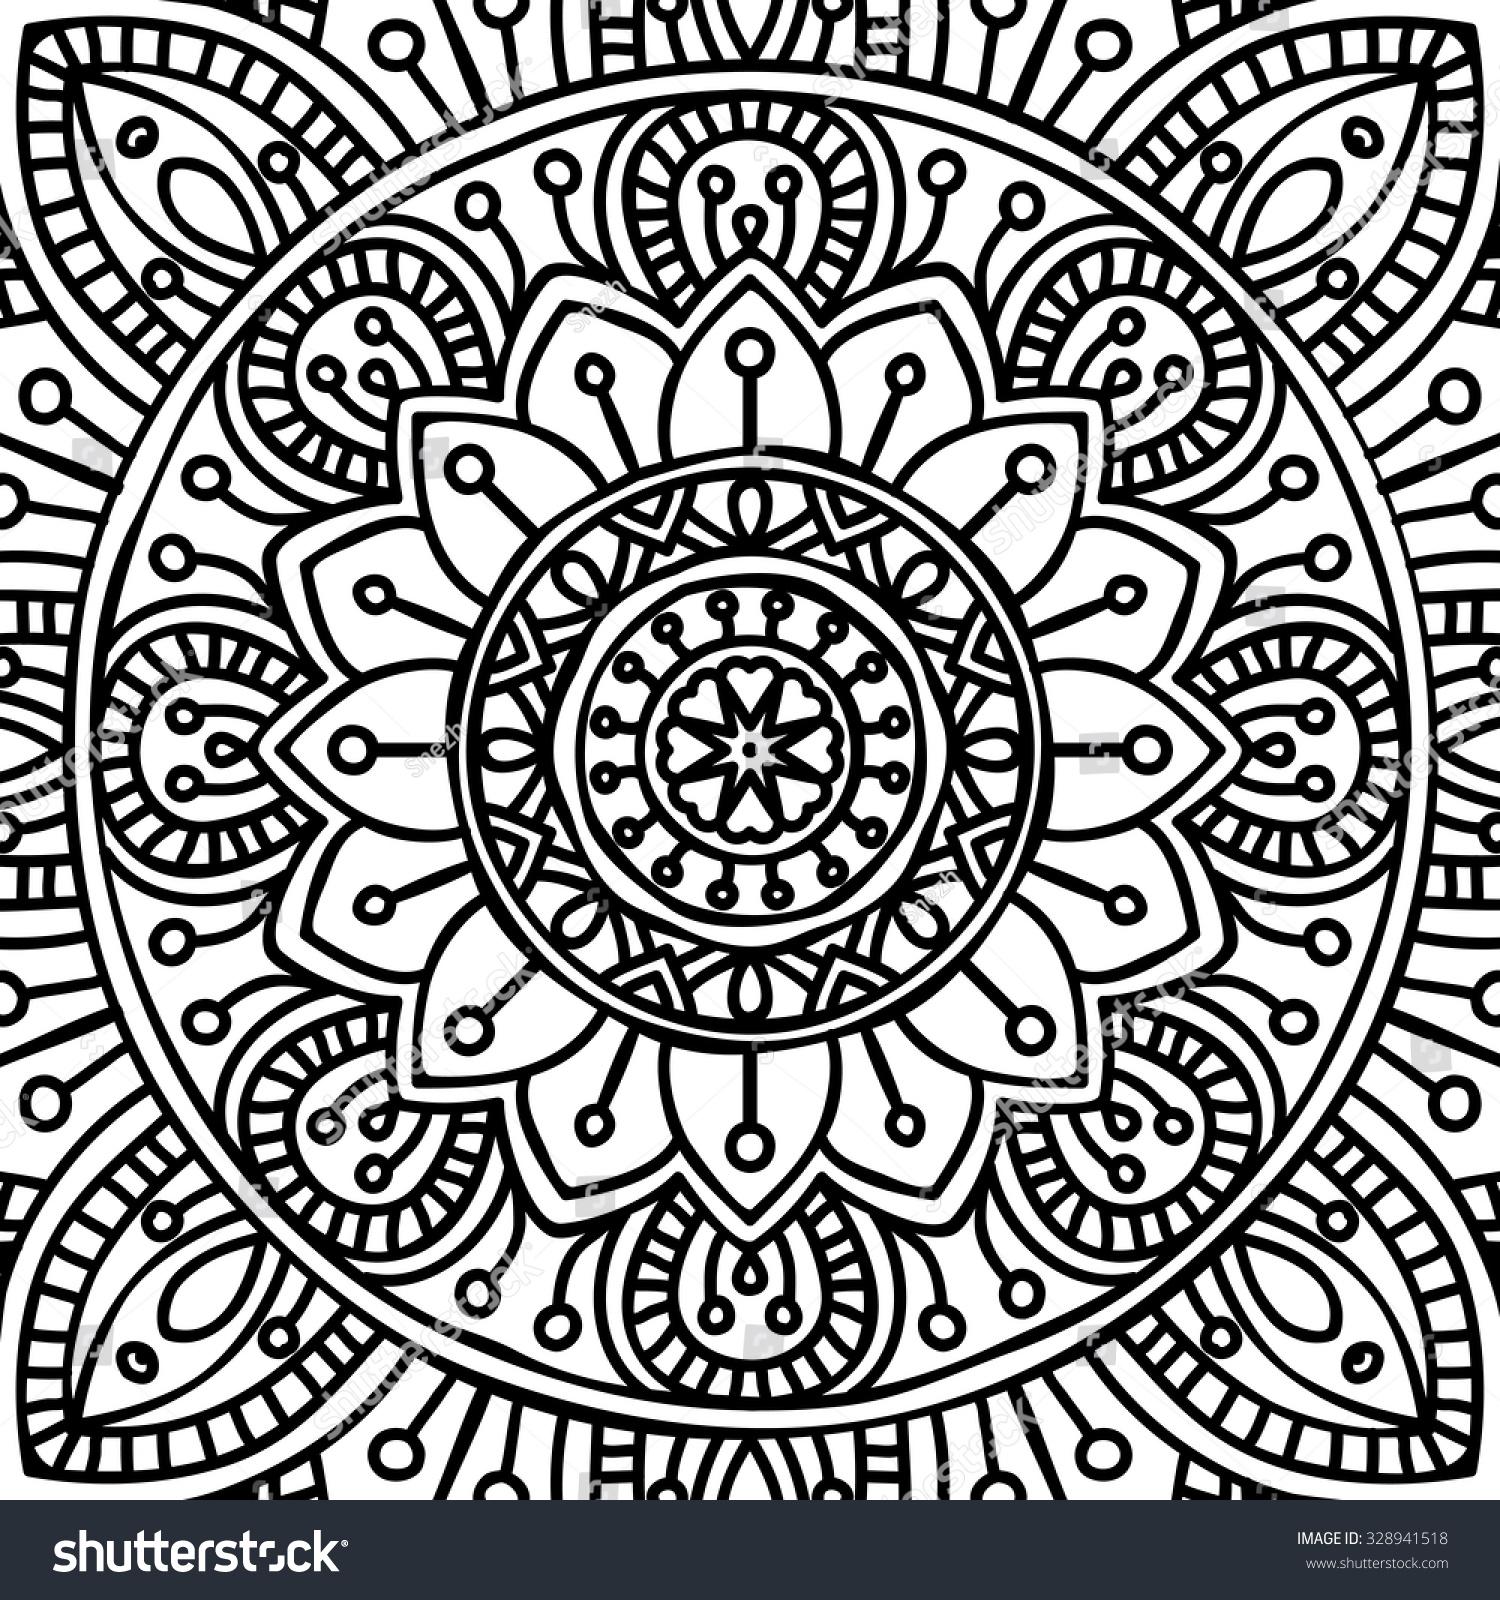 Mandala Vintage Coloring Pages Hellokids Page Decorative Elements Stock